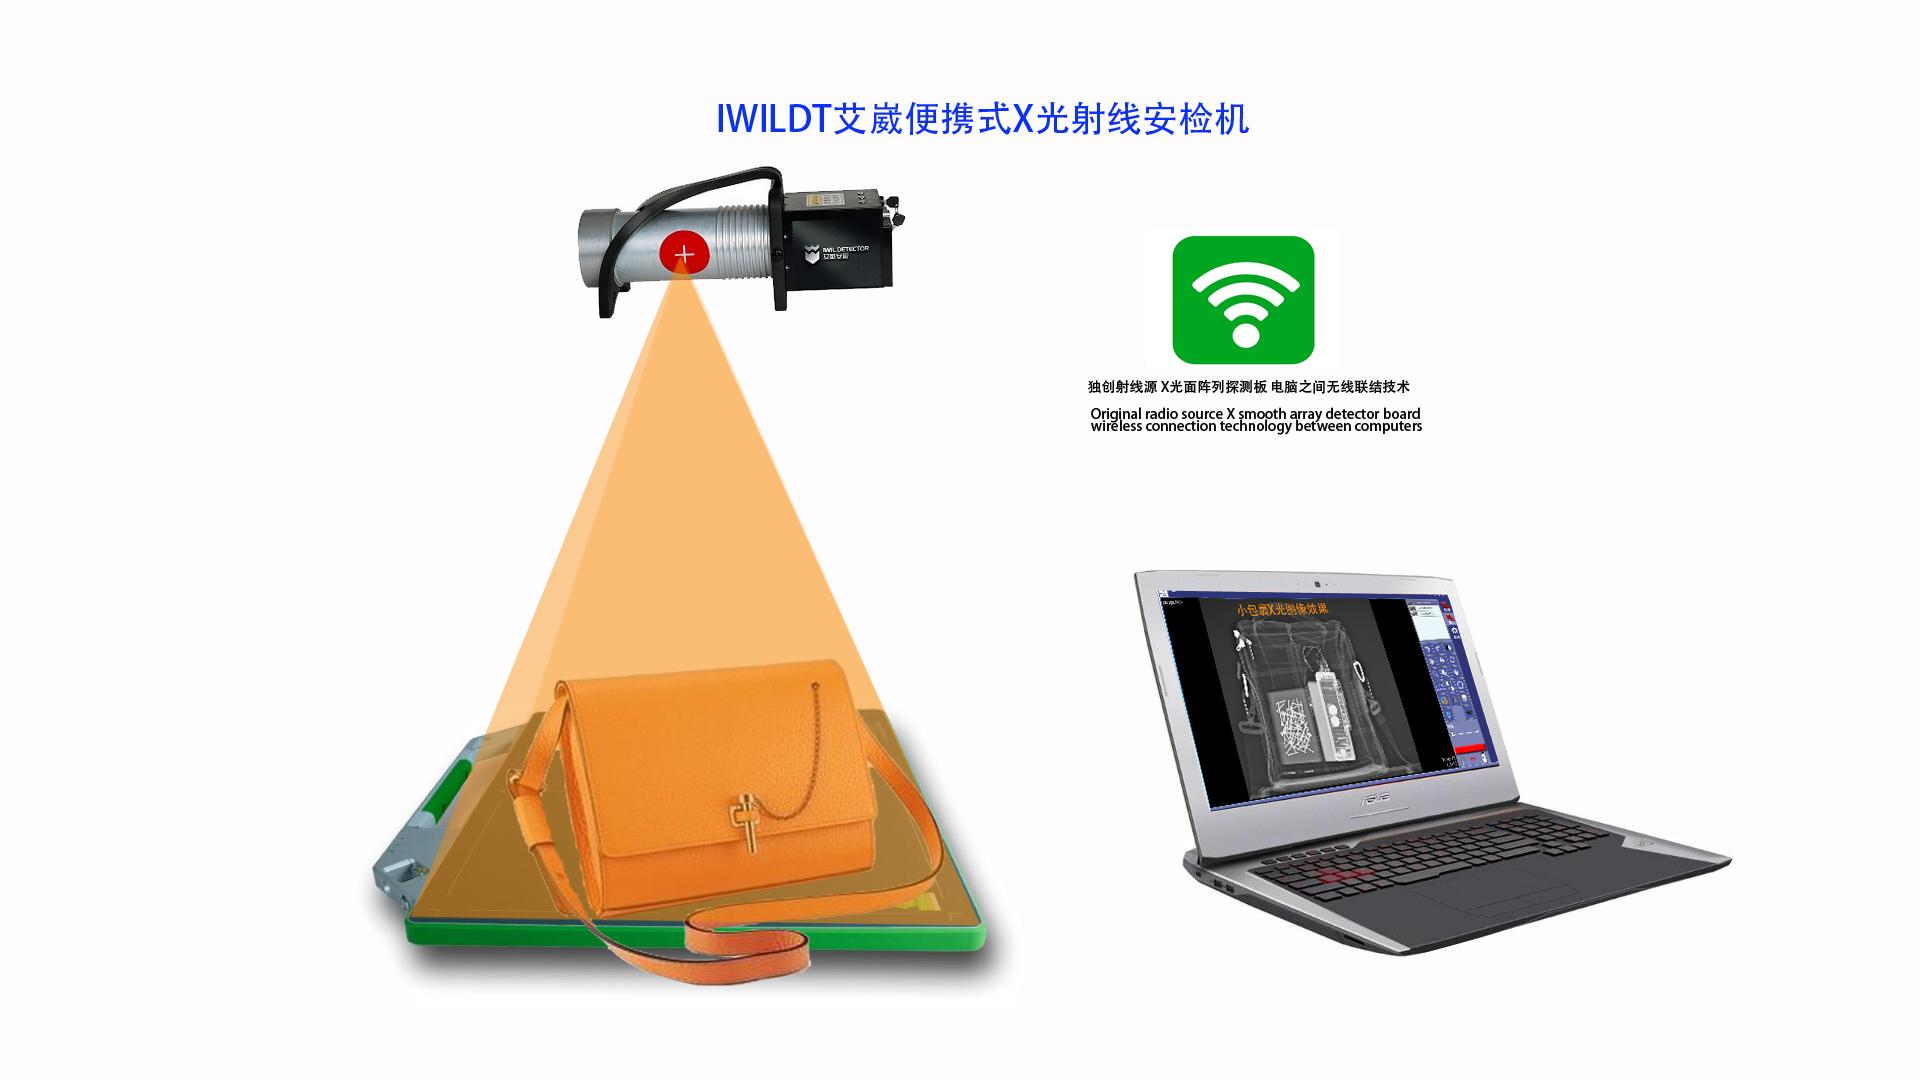 IWILDT 4335便携式安检机英文版使用说明